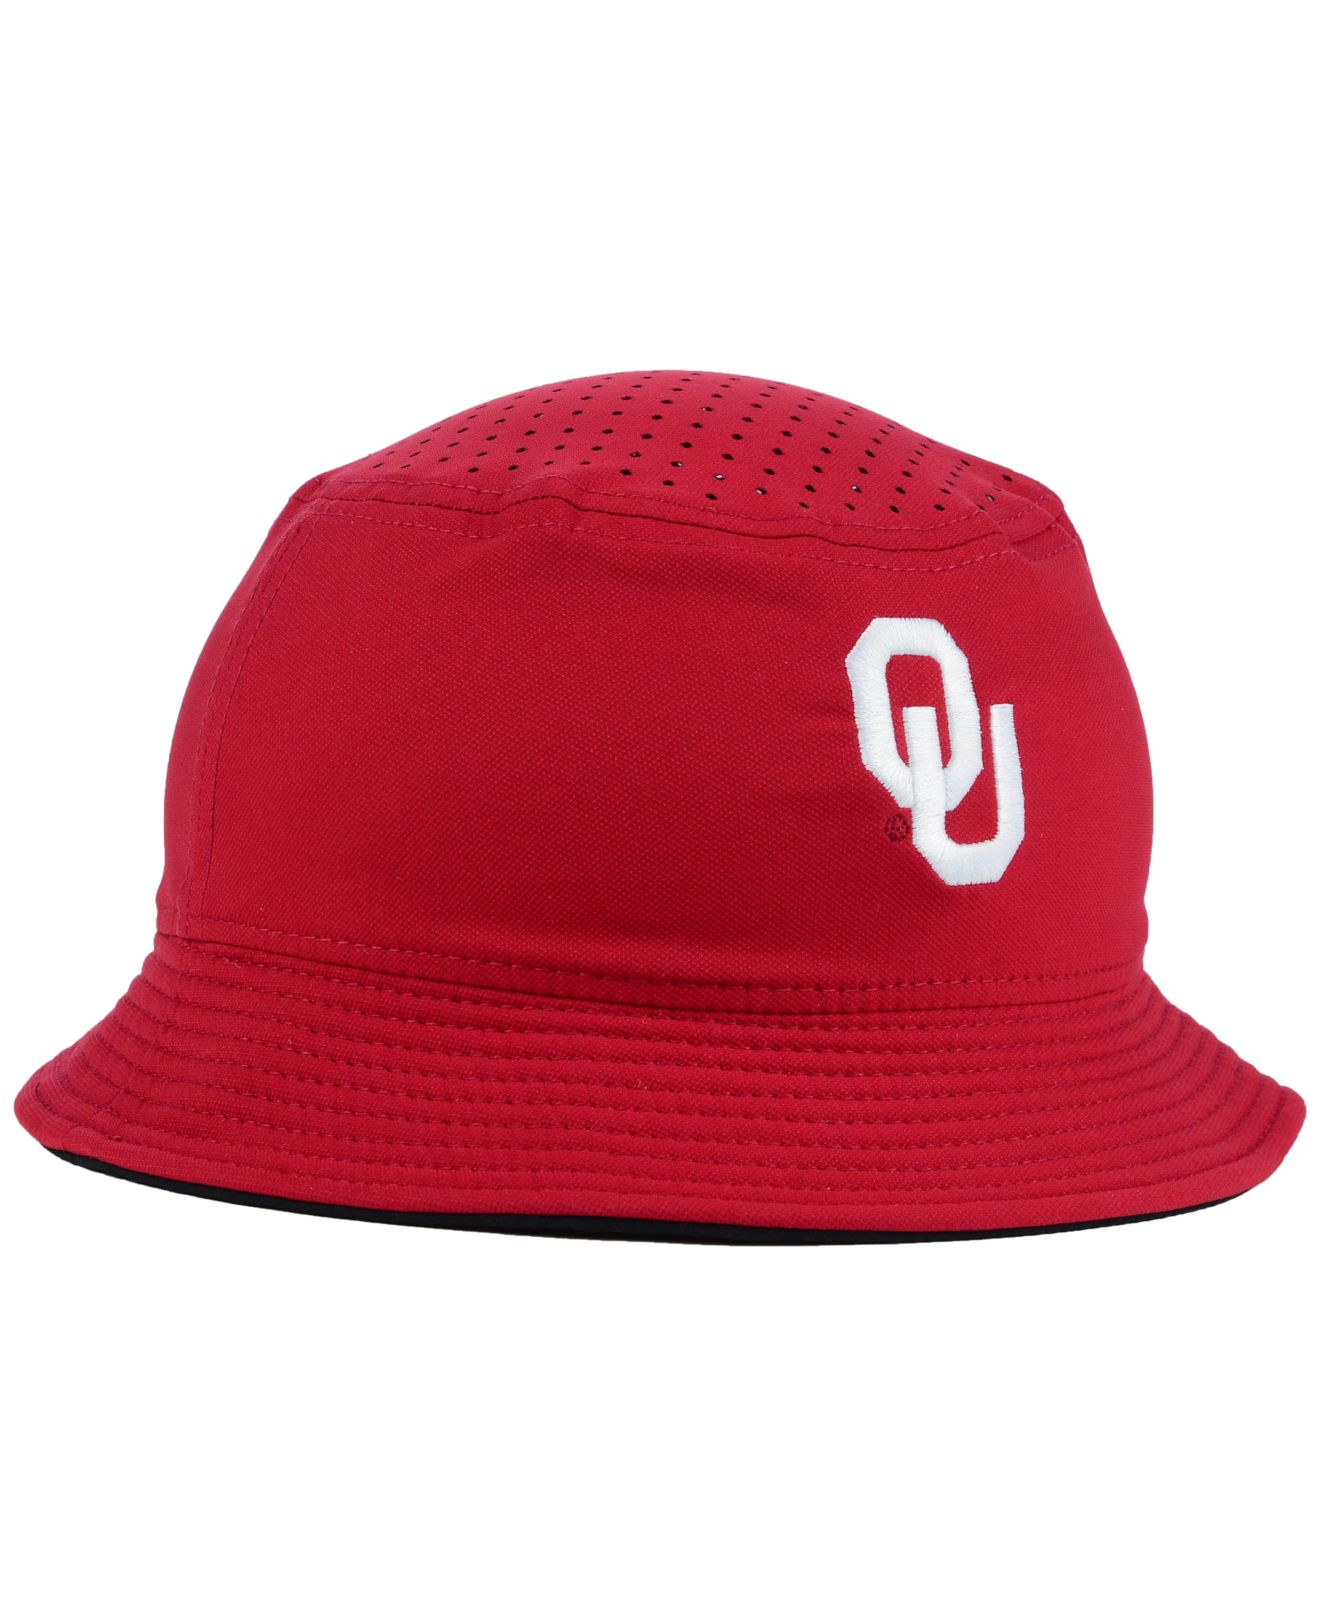 detailed look 0b74e 40c72 ... cheapest lyst nike oklahoma sooners vapor bucket hat in purple for men  7ce4e 7f08b